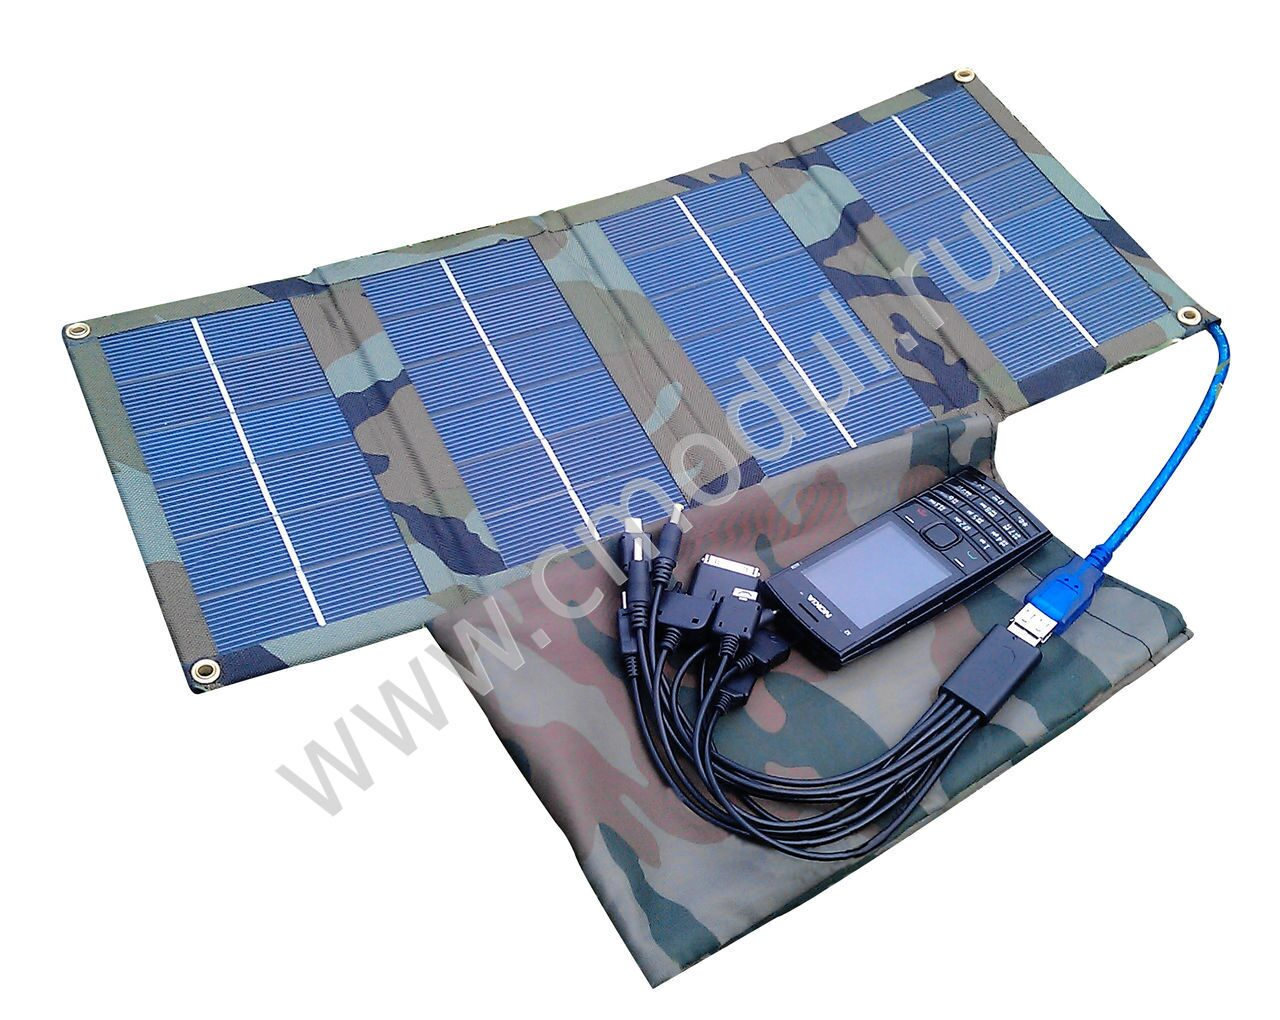 Холодильник на солнечных батареях своими руками